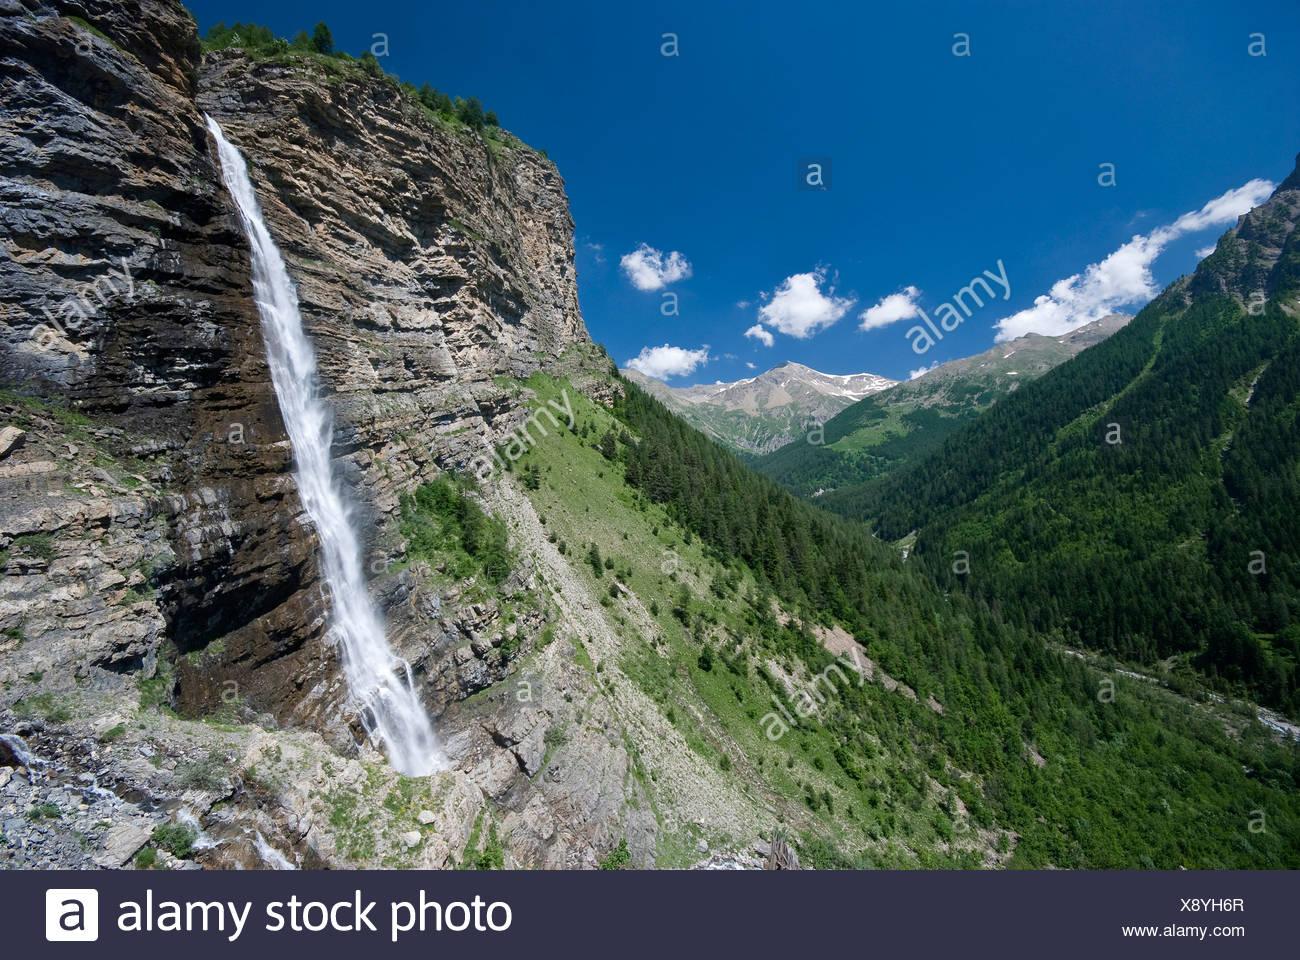 La Pisse cascata. Rabioux Valley. Des Ecrins Nat. Parco. Francia Immagini Stock